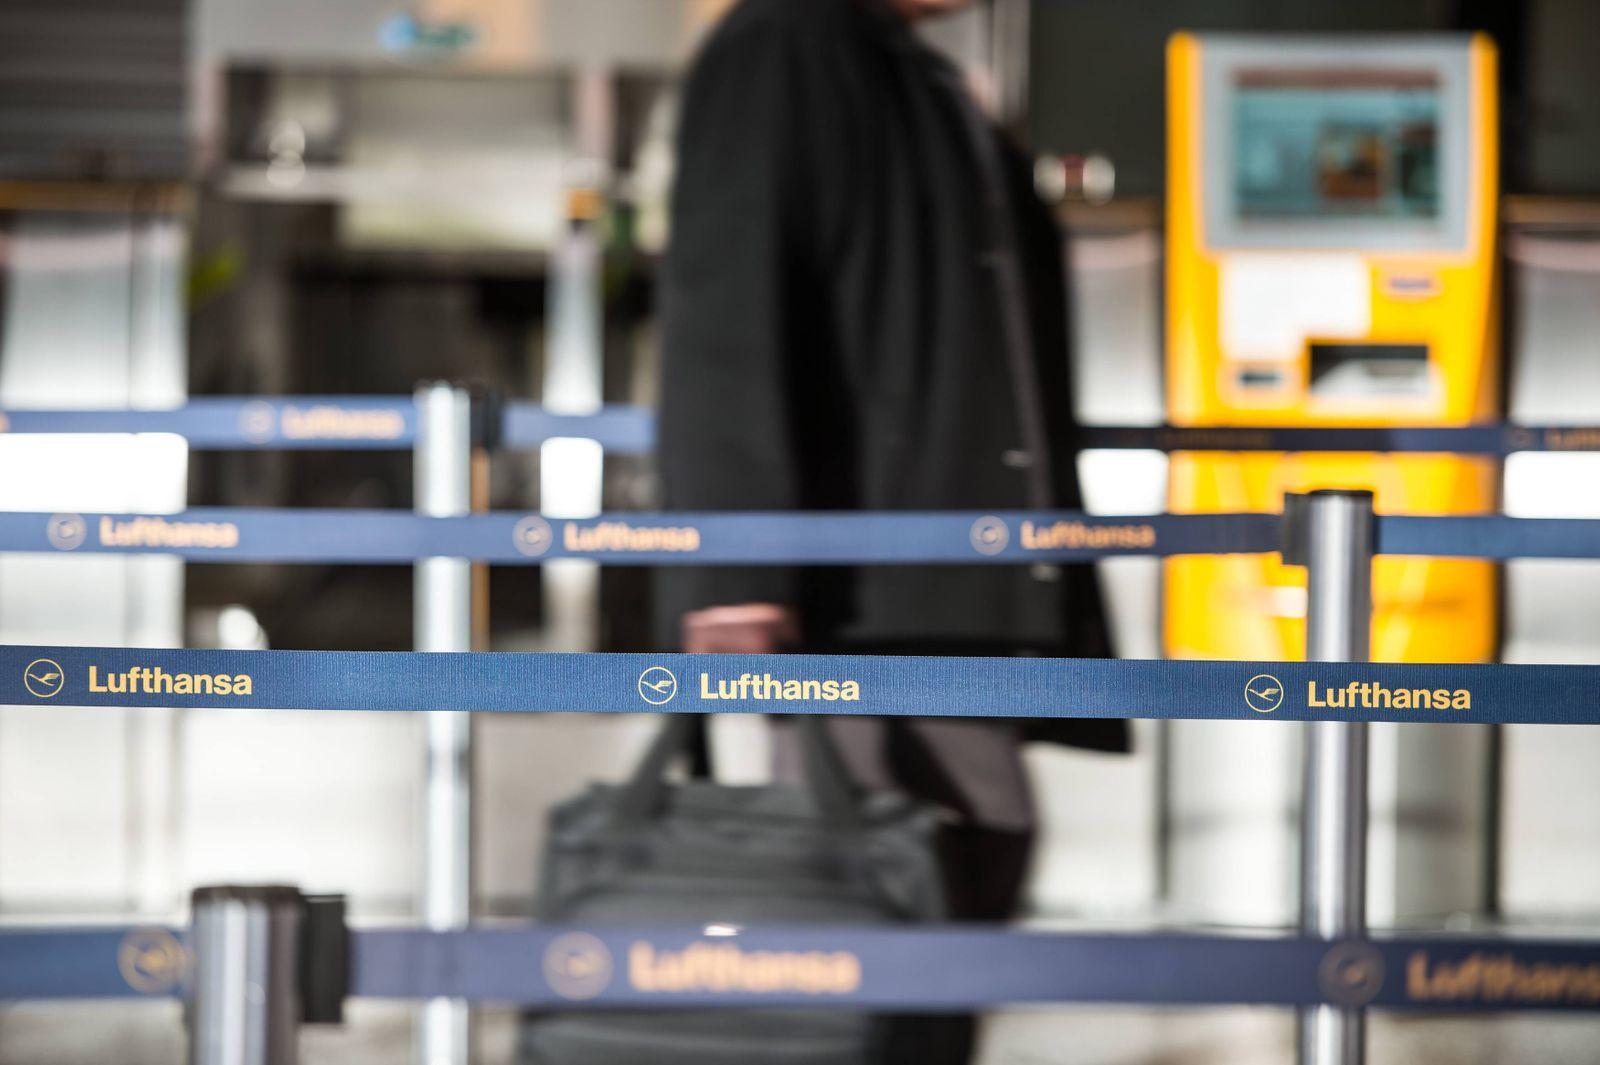 29.11.2016, xmhx, News Lokales, Lufthansa Streik Frankfurt am Main Flughafen 2016, v.l. Passagier läuft durch den Schal